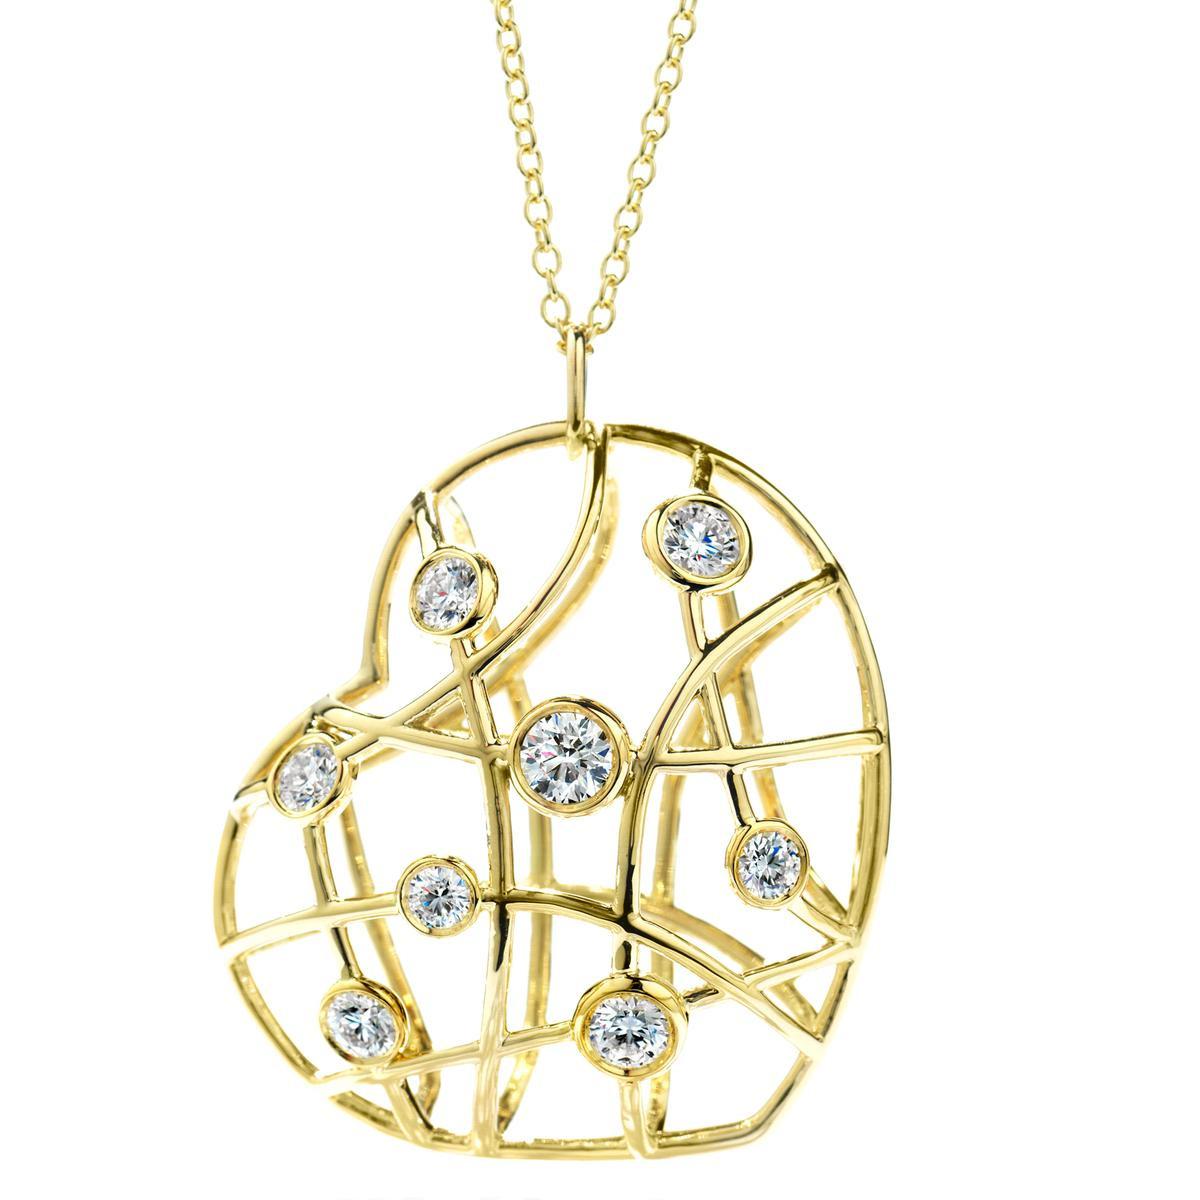 New Hearts On Fire® 1.18 CTW Diamond Brocade Heart Pendant